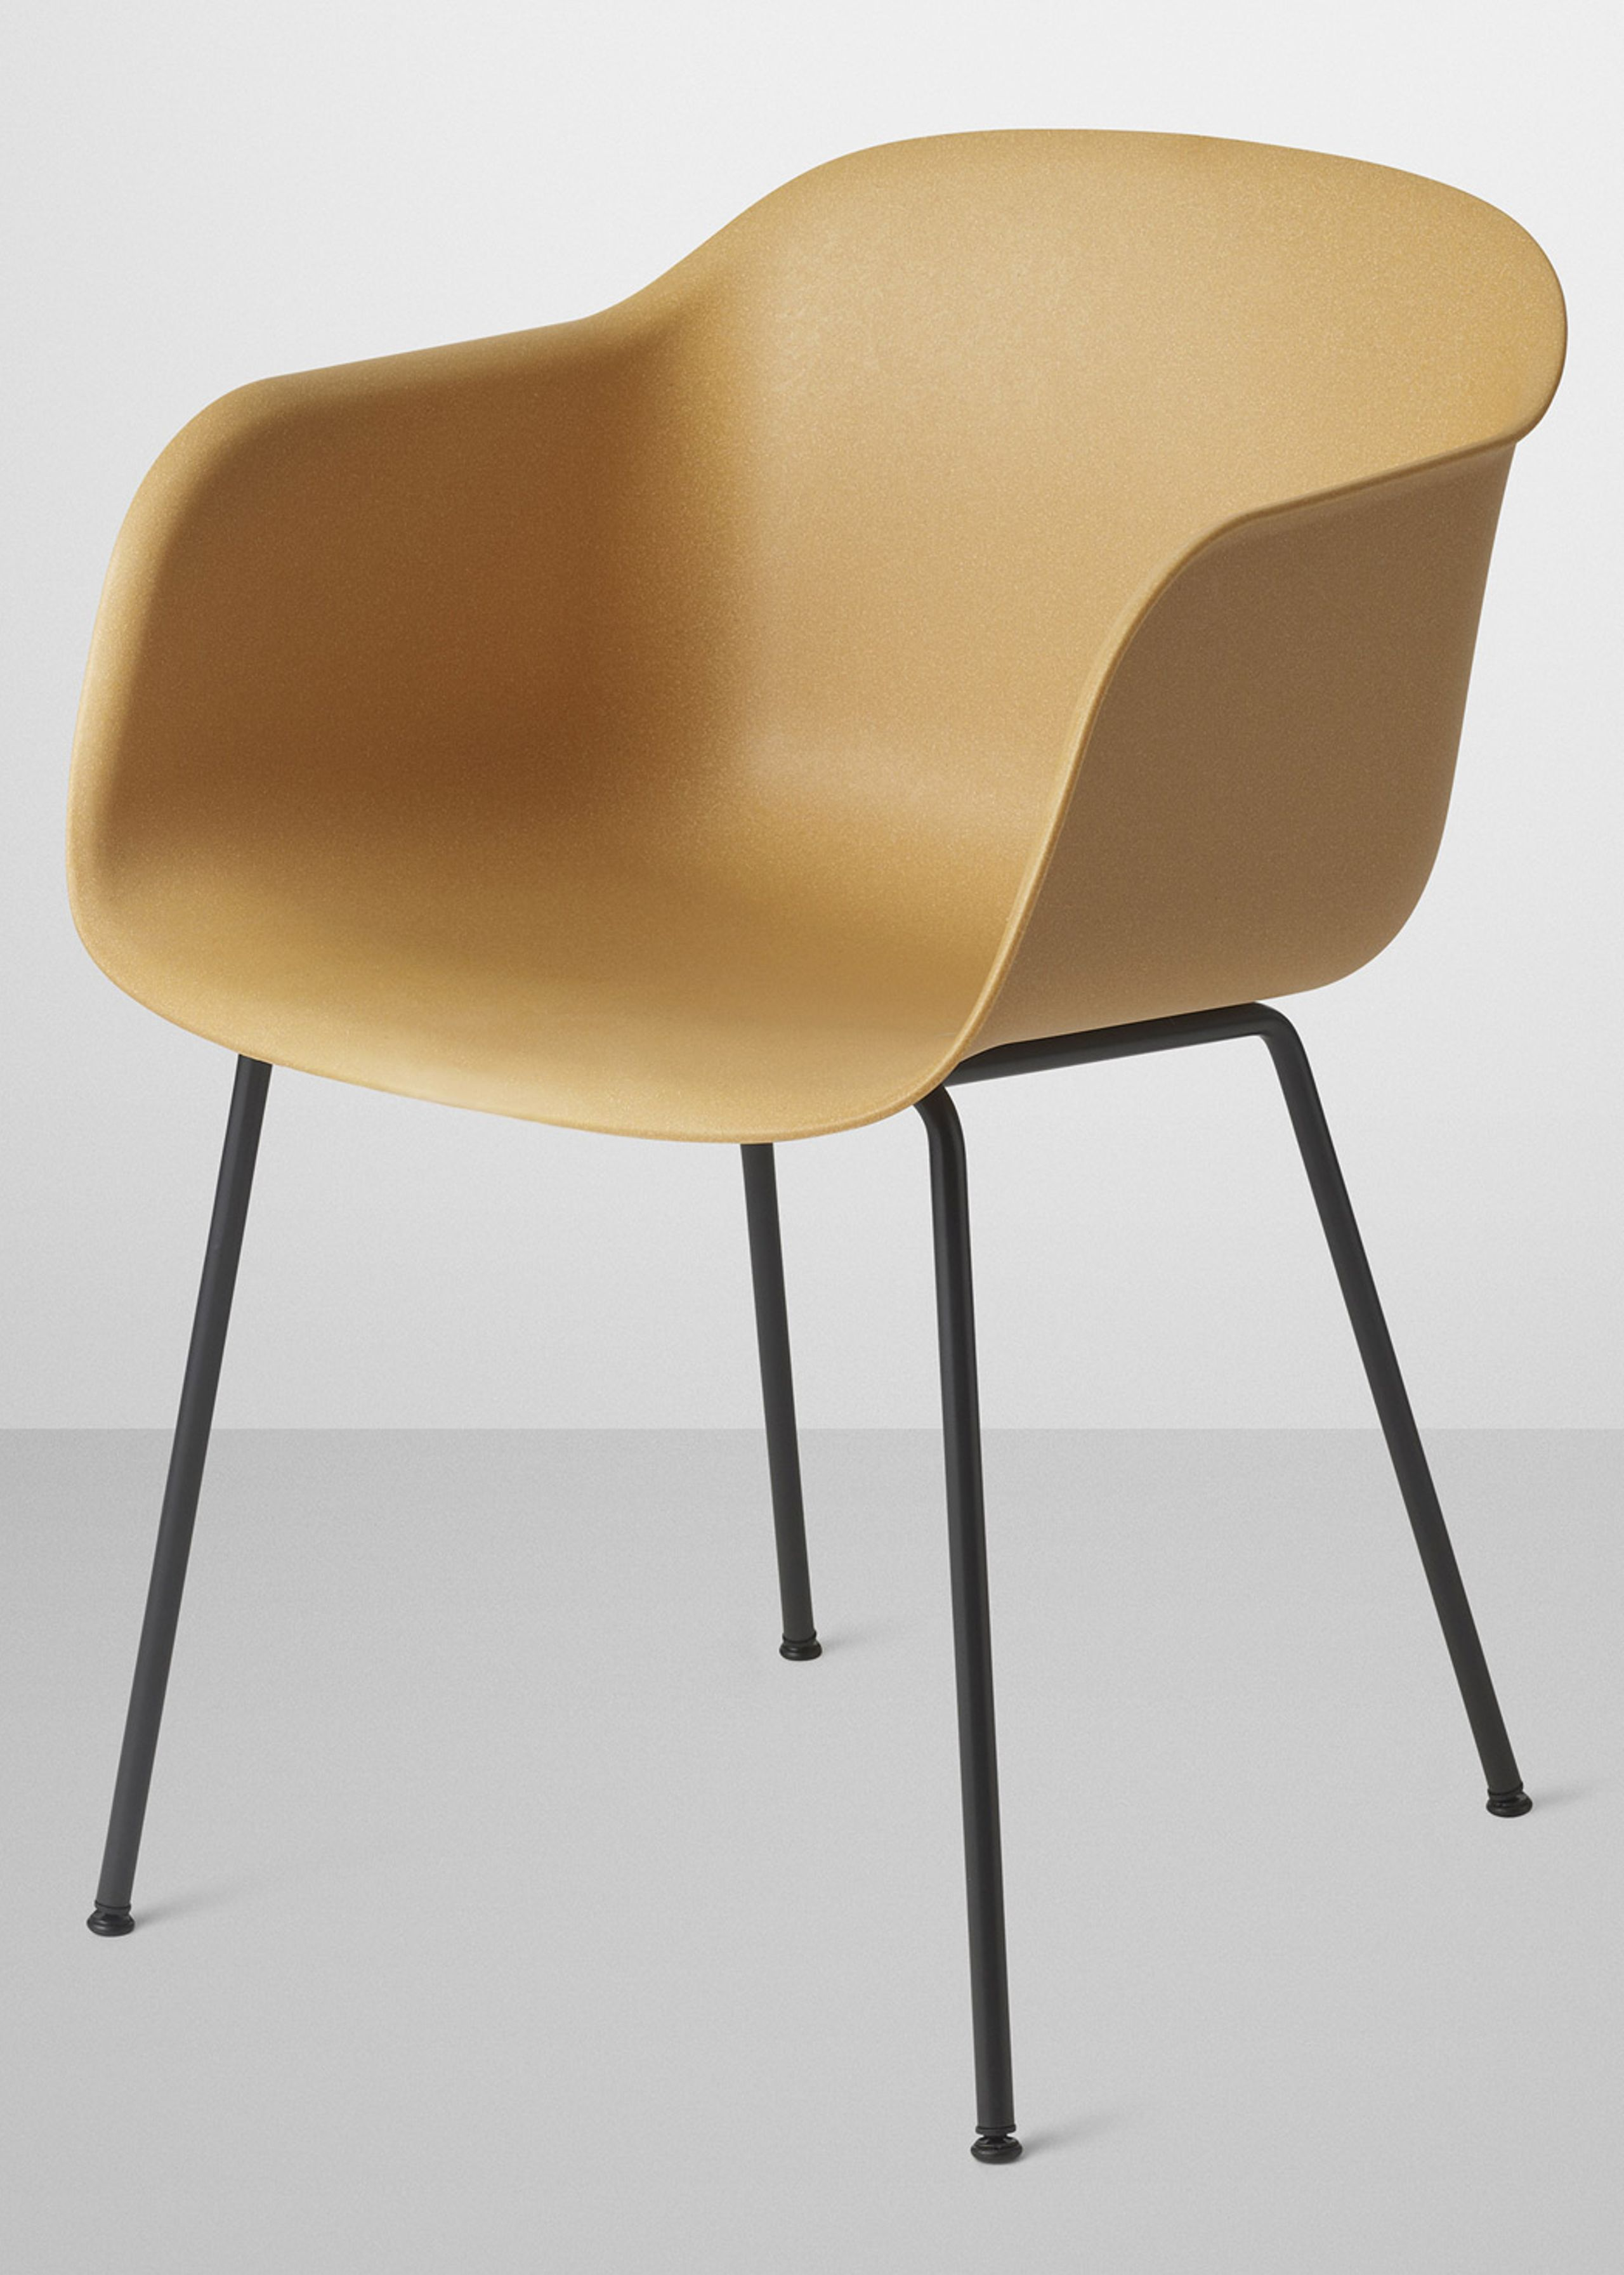 fiber chair tube base chair muuto. Black Bedroom Furniture Sets. Home Design Ideas